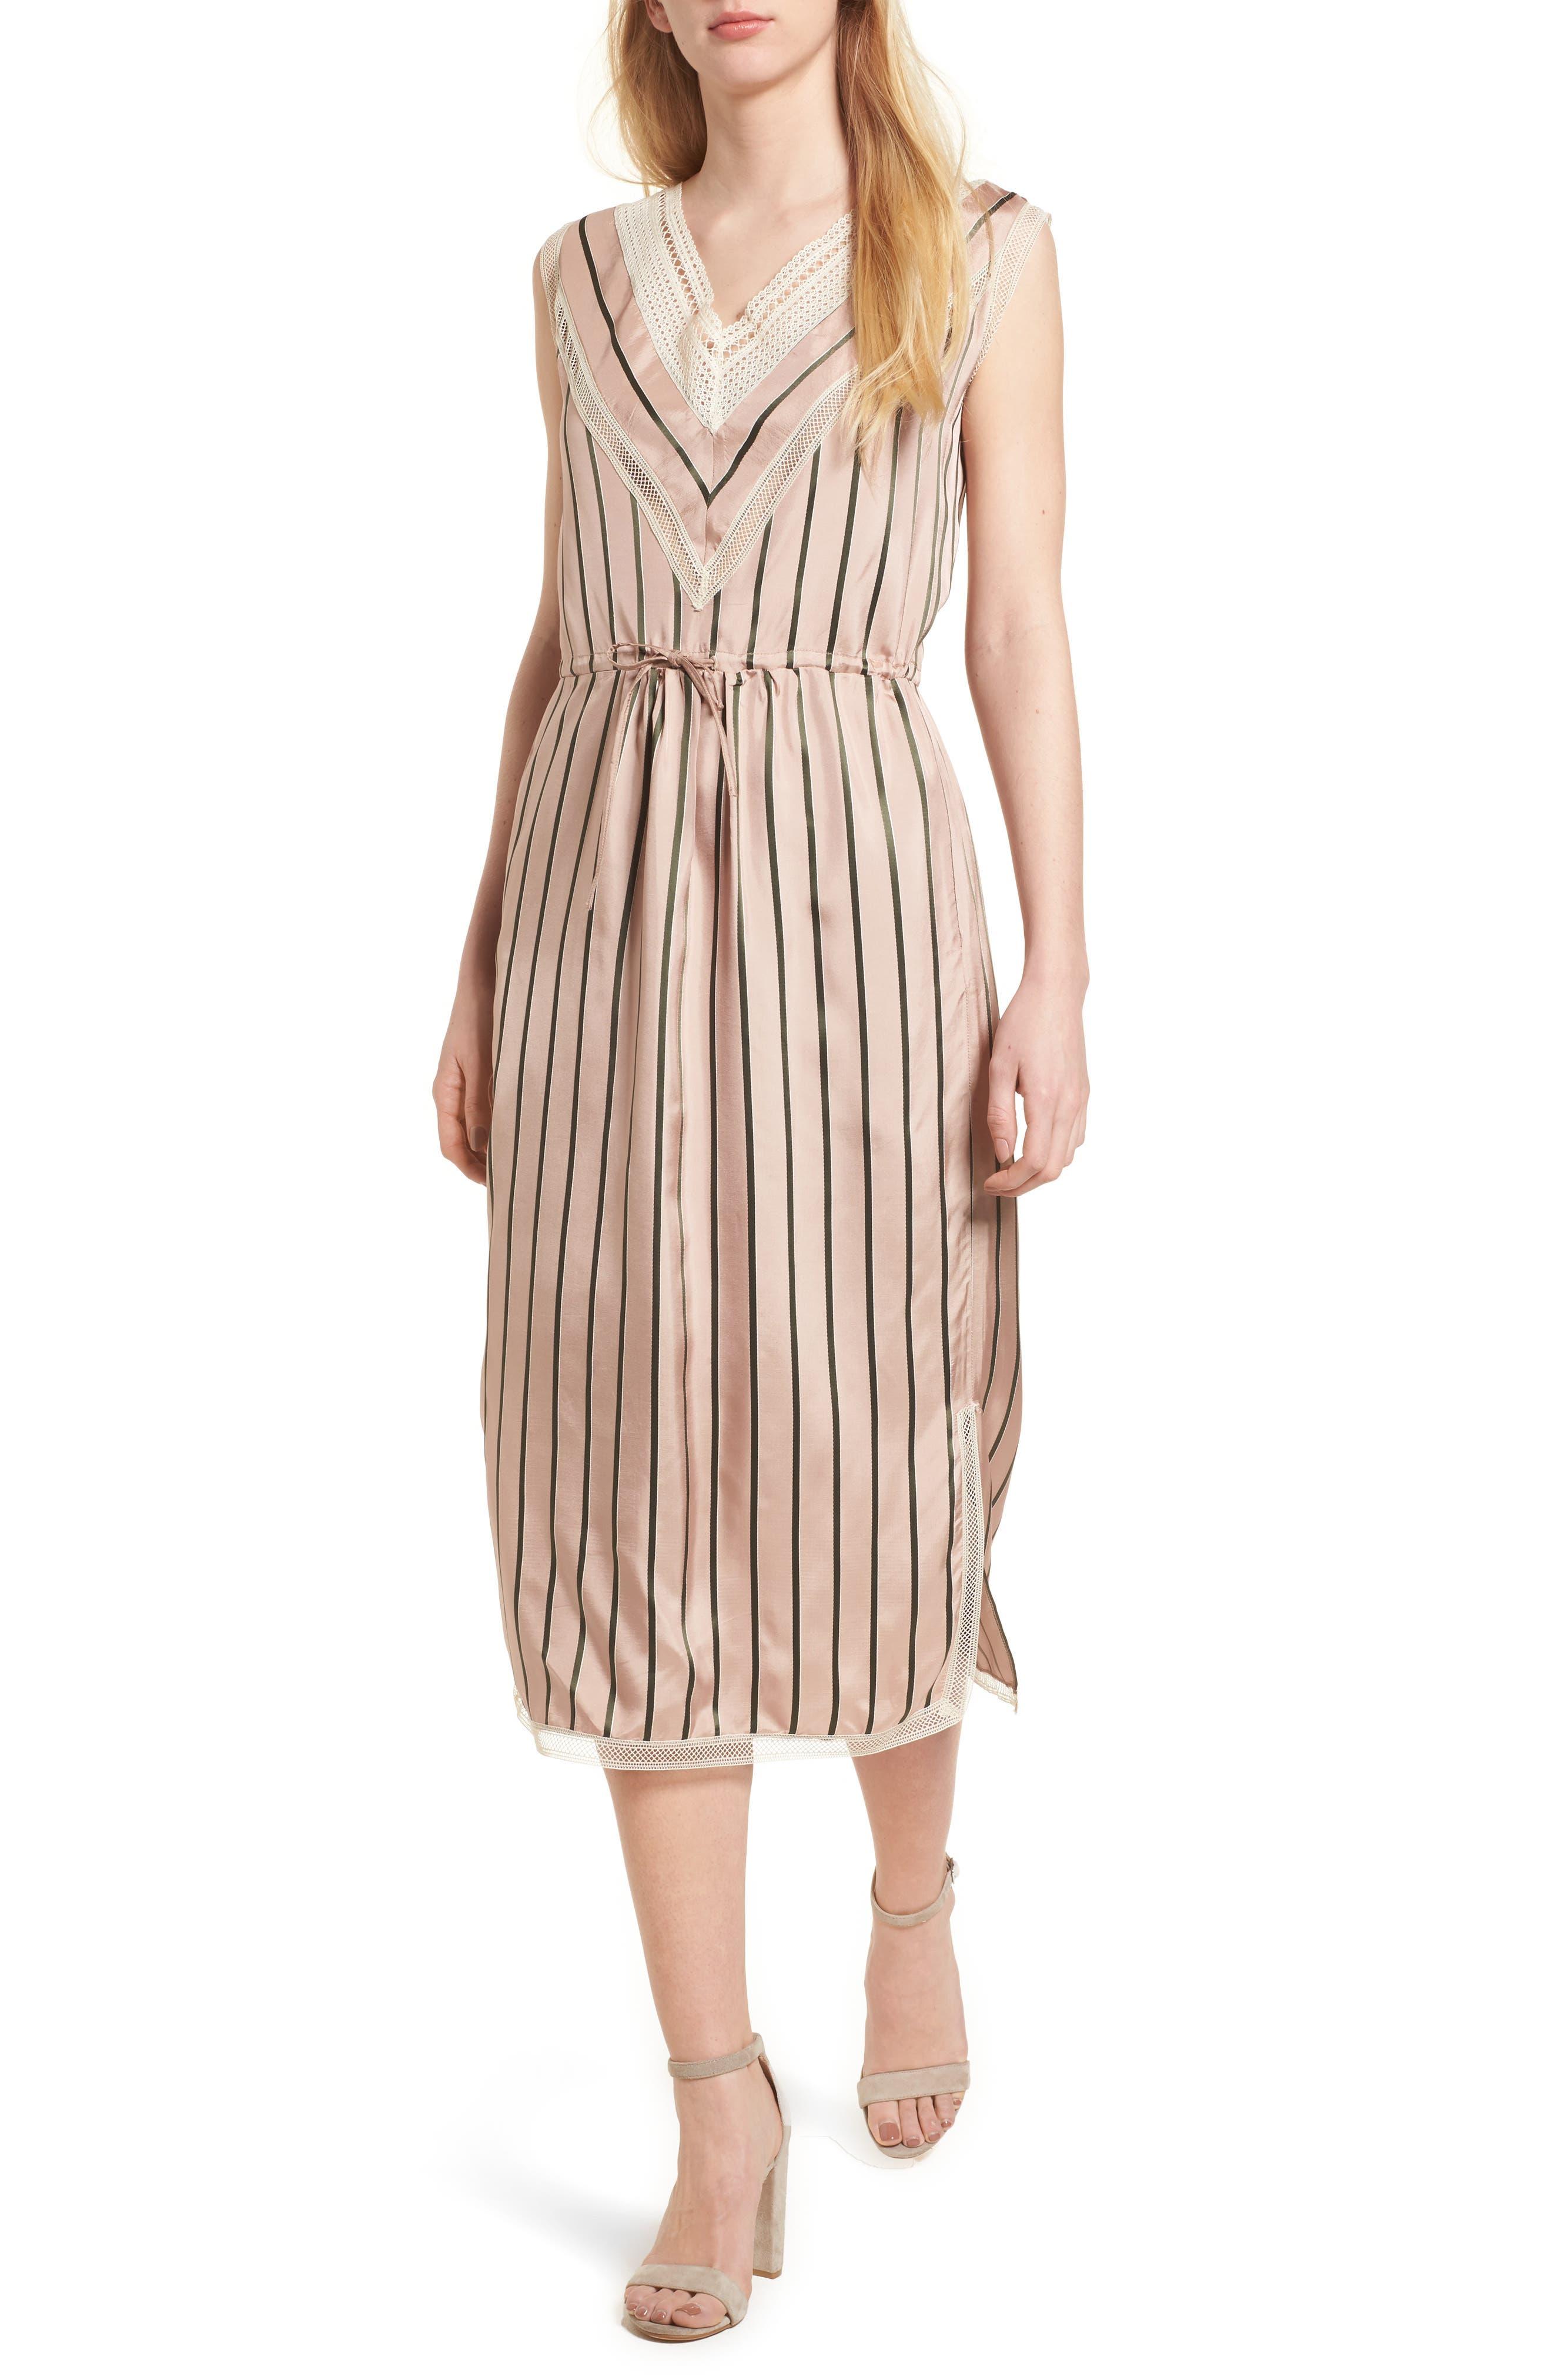 Cosway Dress,                             Main thumbnail 1, color,                             Salmon